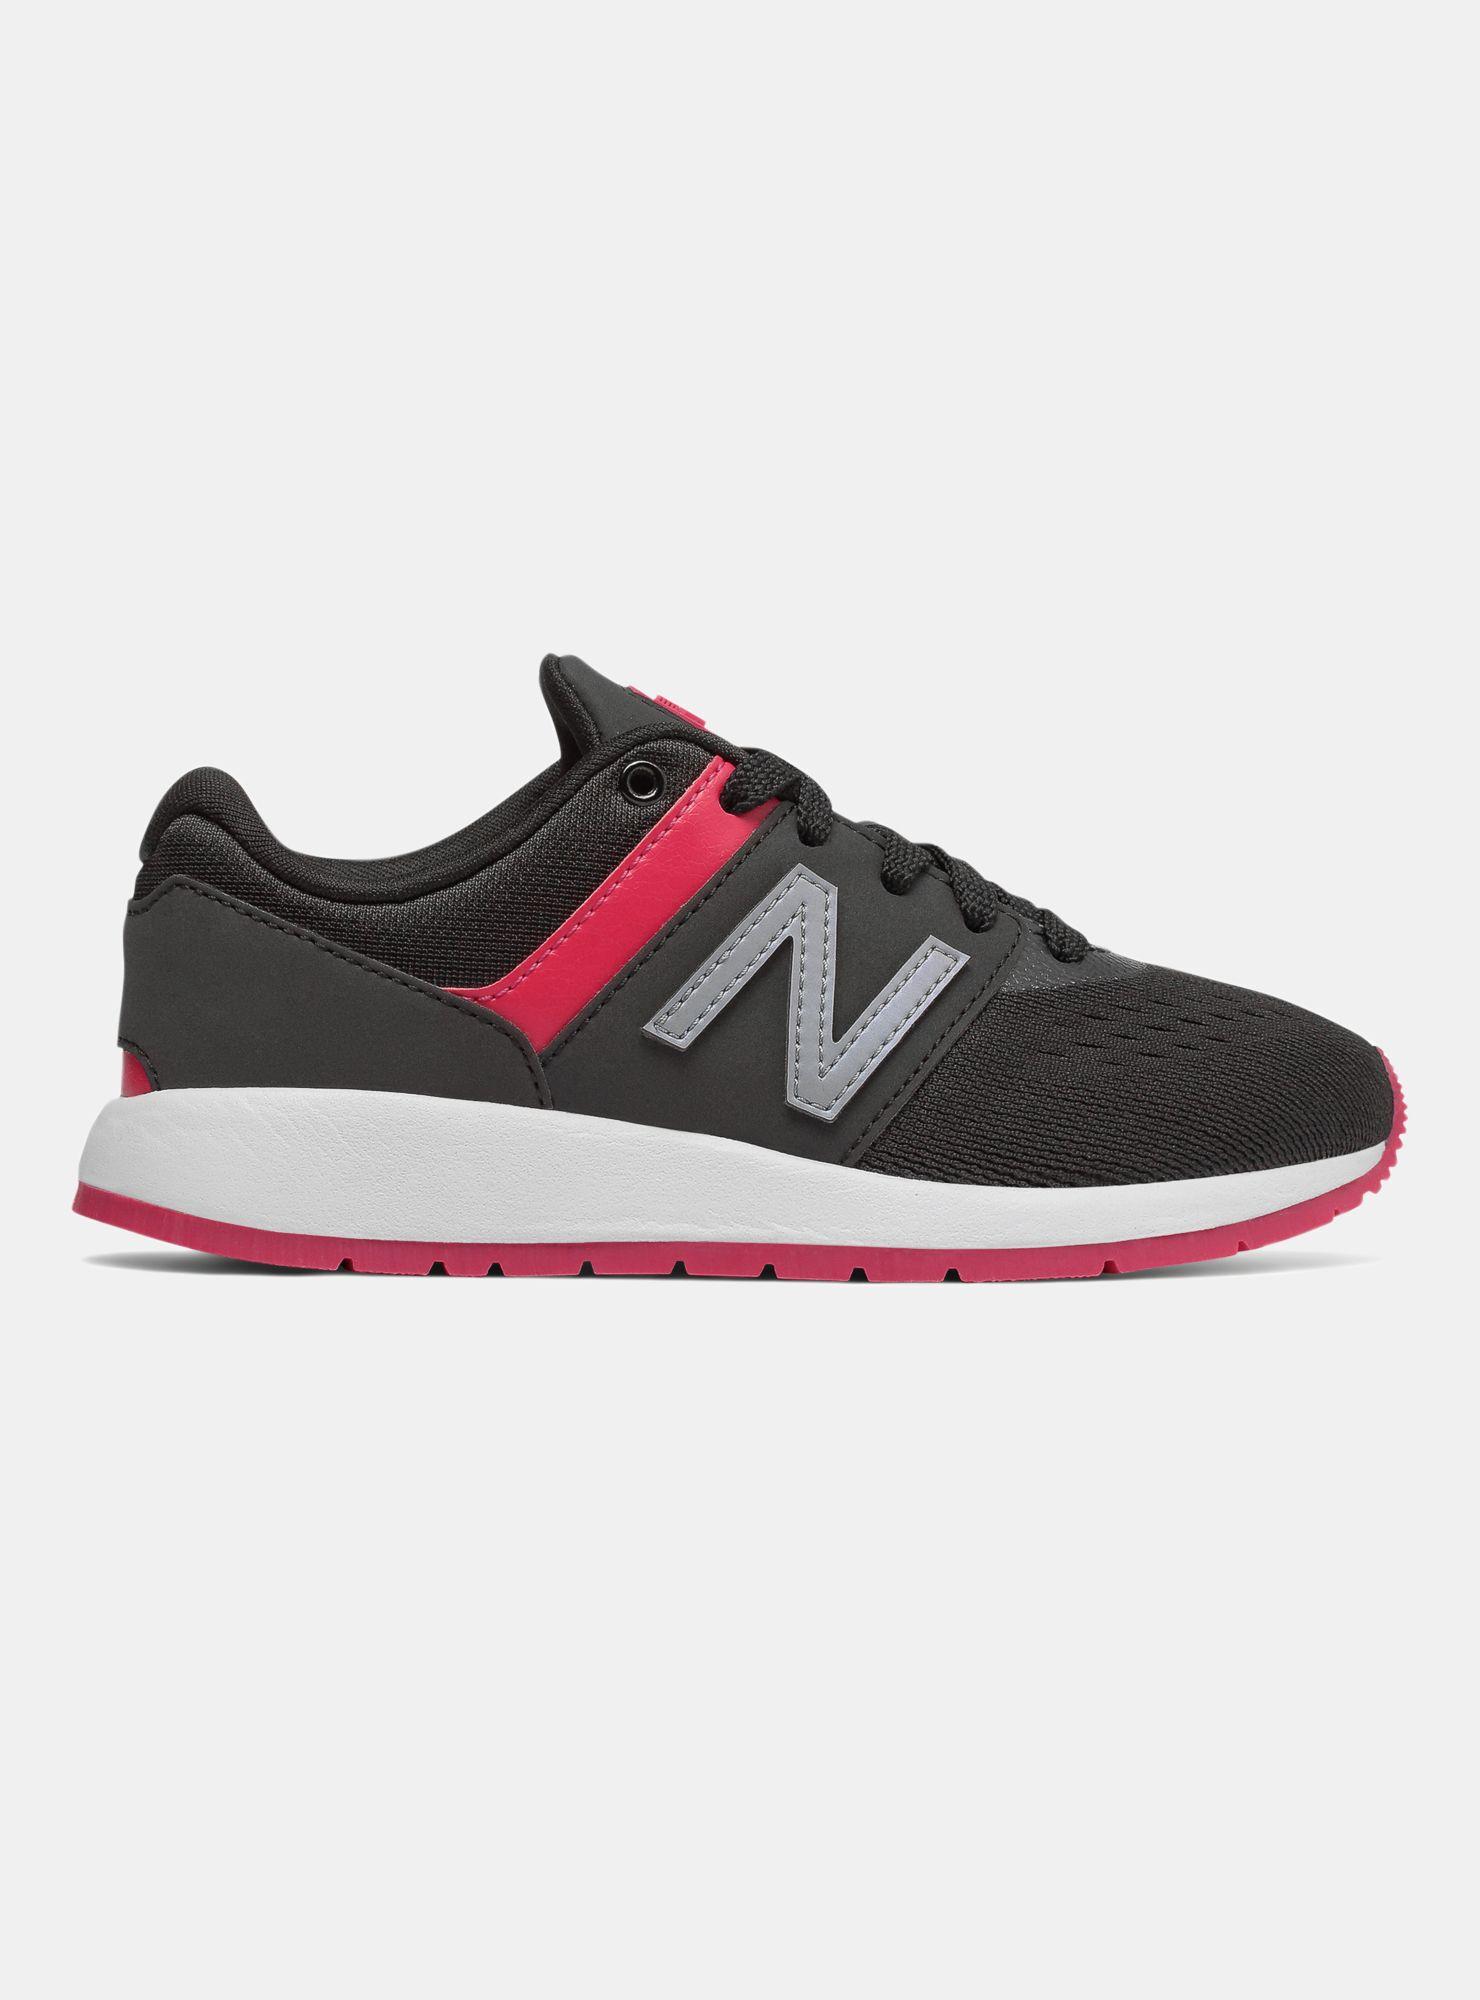 venta de zapatillas new balance online chile